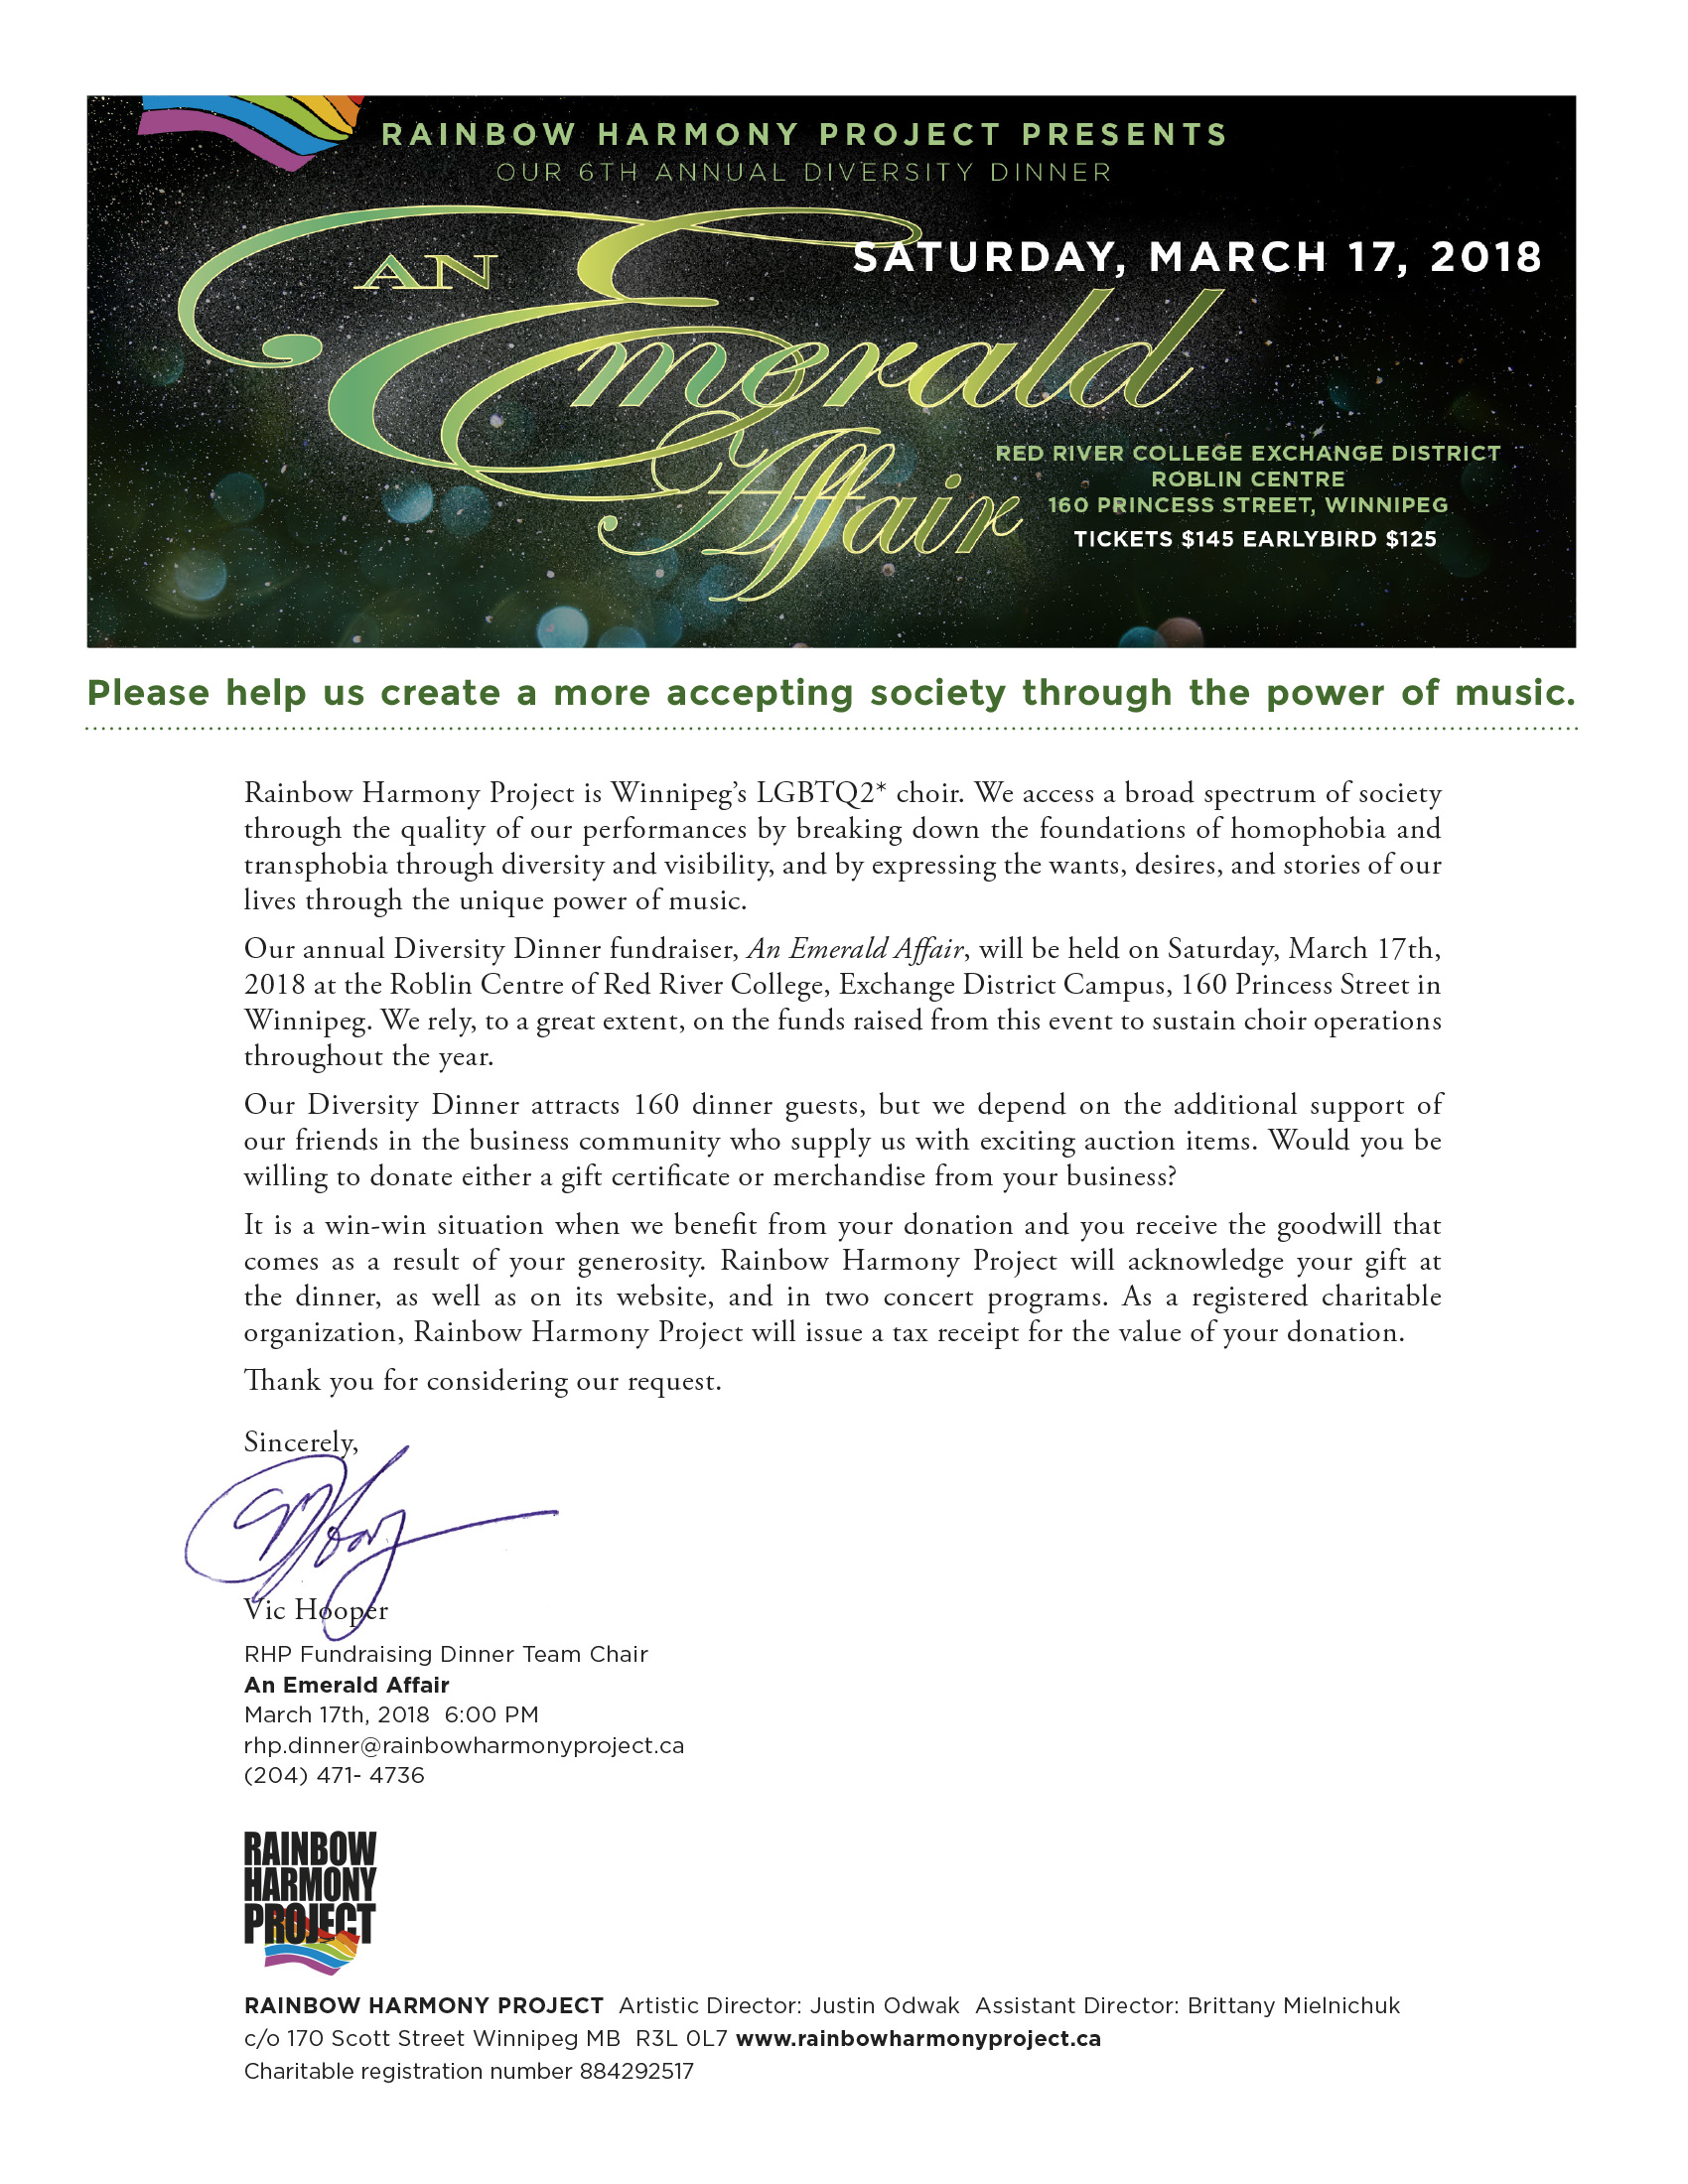 RHP-An-Emerald-Affair-donations-invitation.jpg